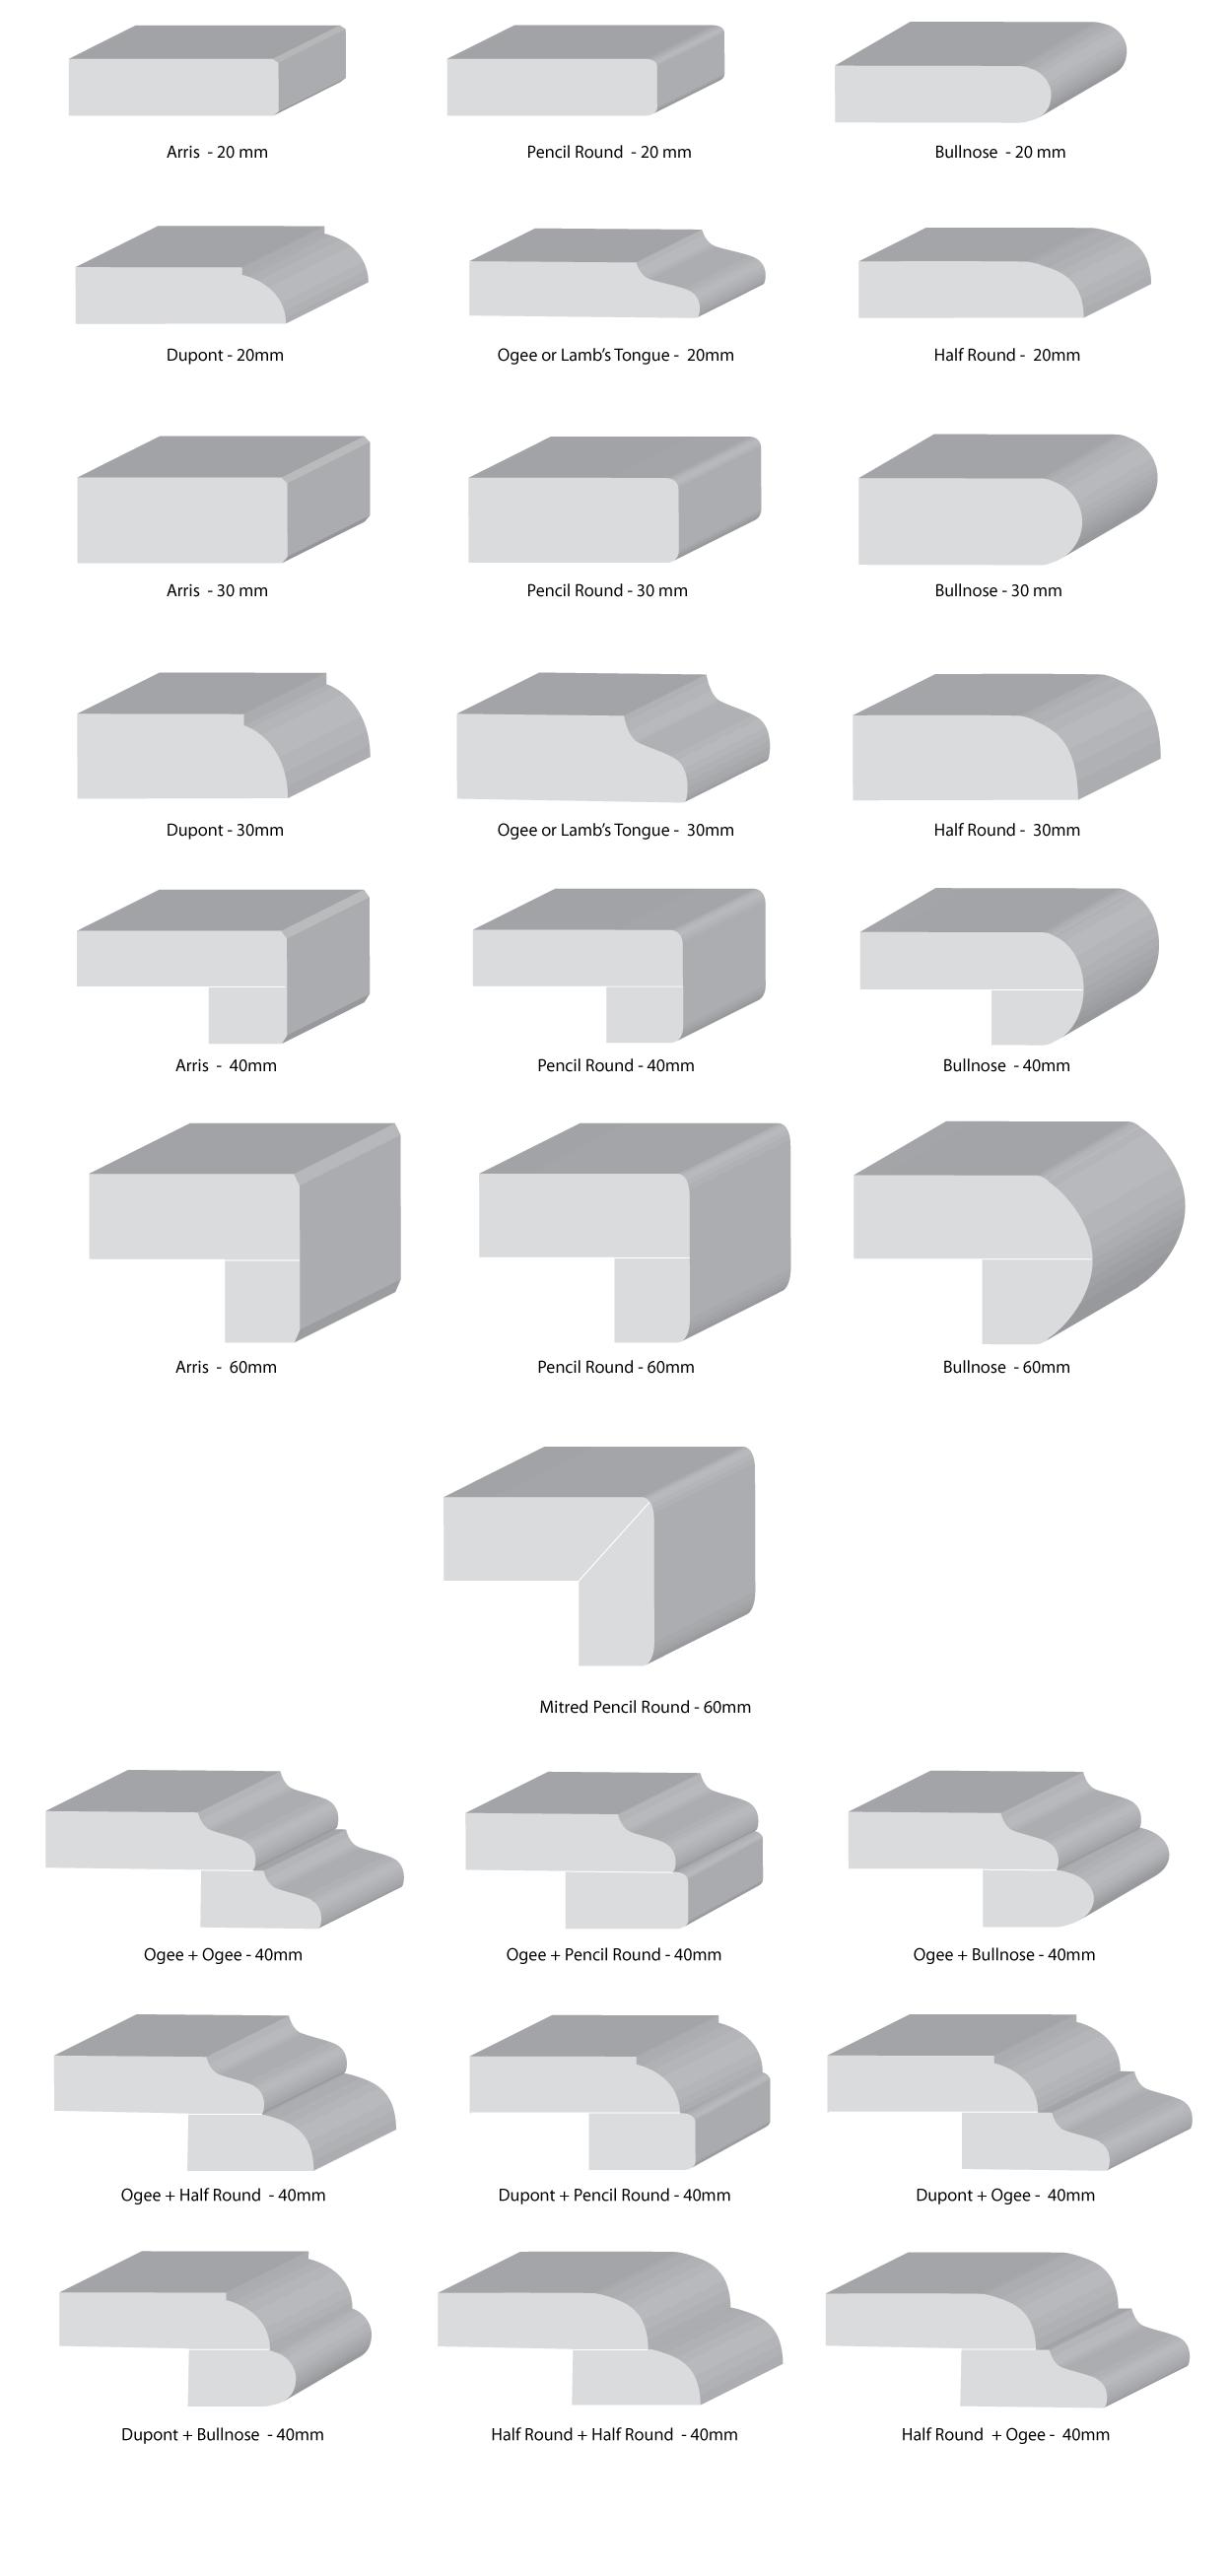 Brisbane Granite And Marble Edge Profiles In 2020 Granite Edges Kitchen Marble Granite Benchtop